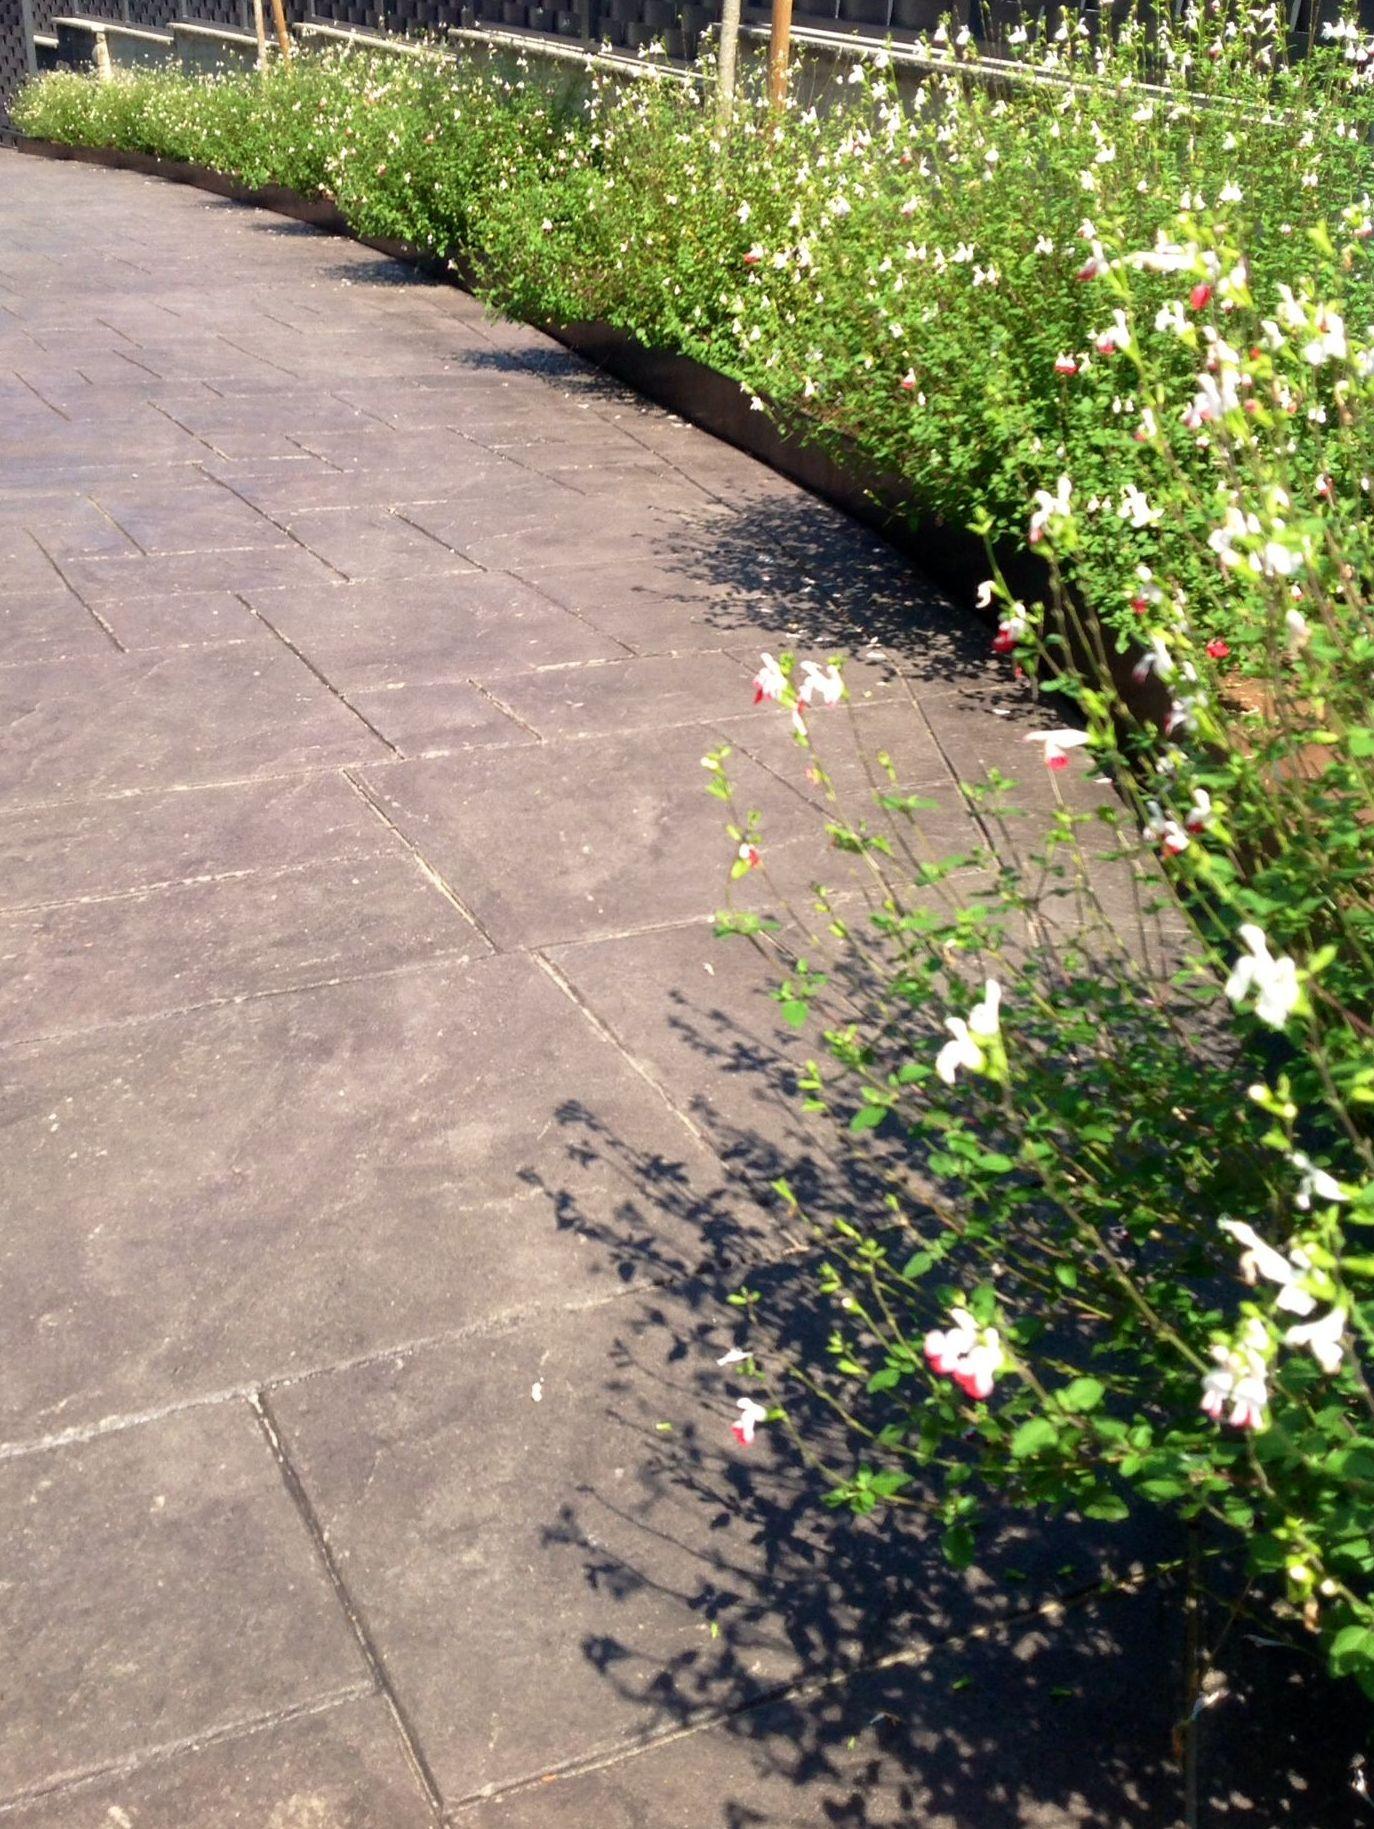 Picture 22 of Jardines (diseño y mantenimiento) in Durango | Jardines Patxi Lorategiak